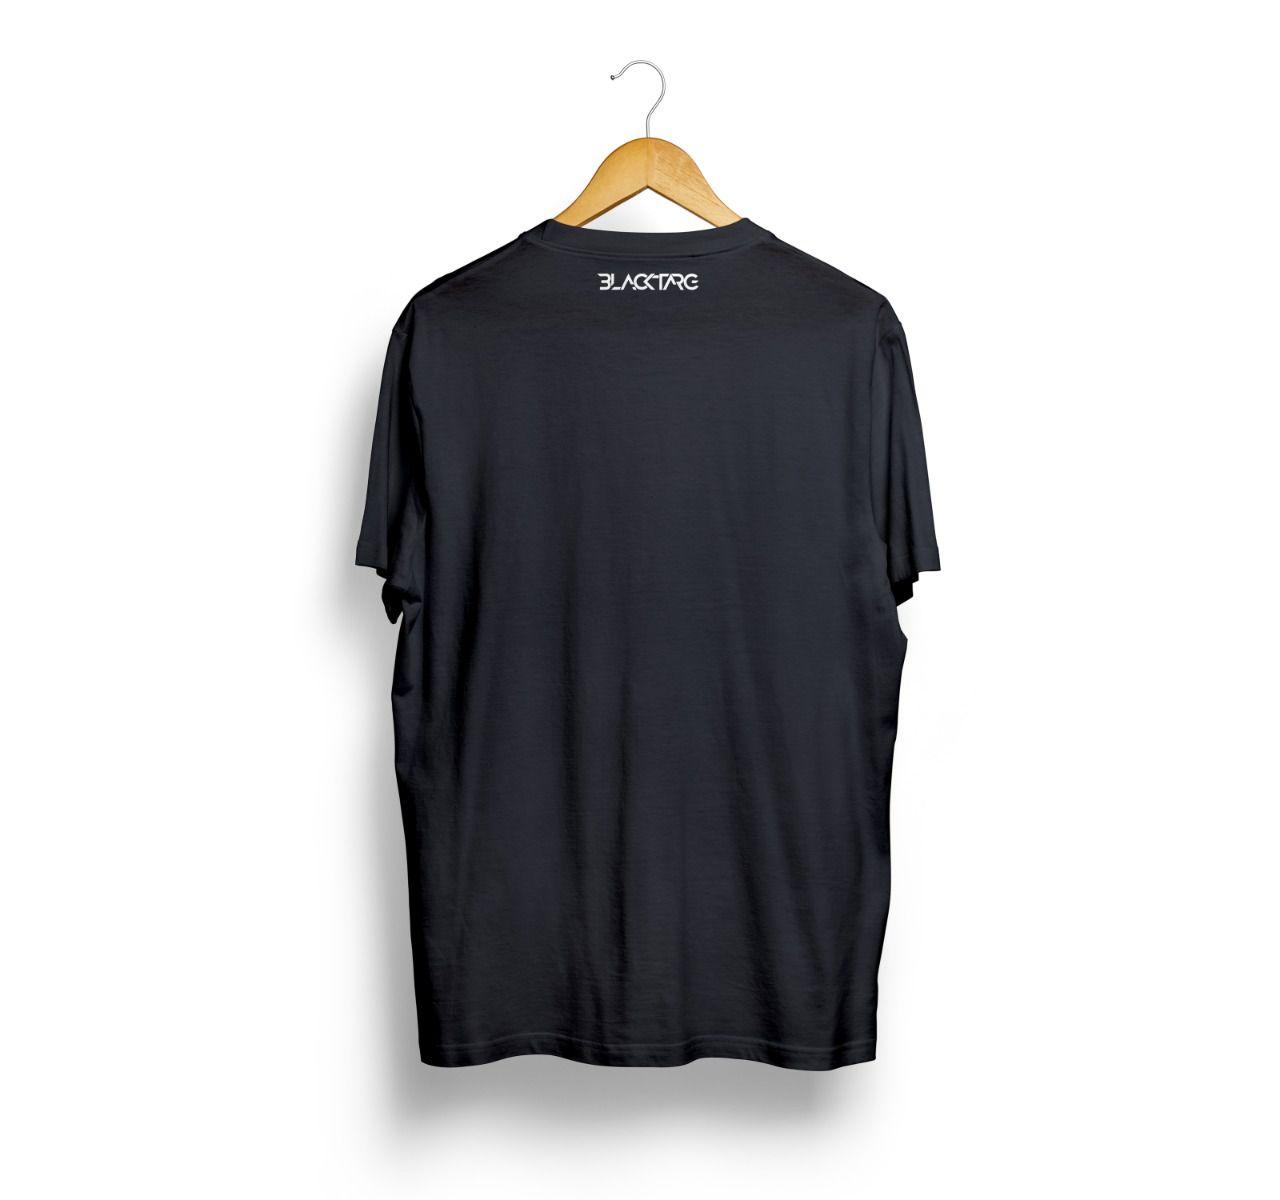 Camiseta Masculina Estampada Black Targ Preta